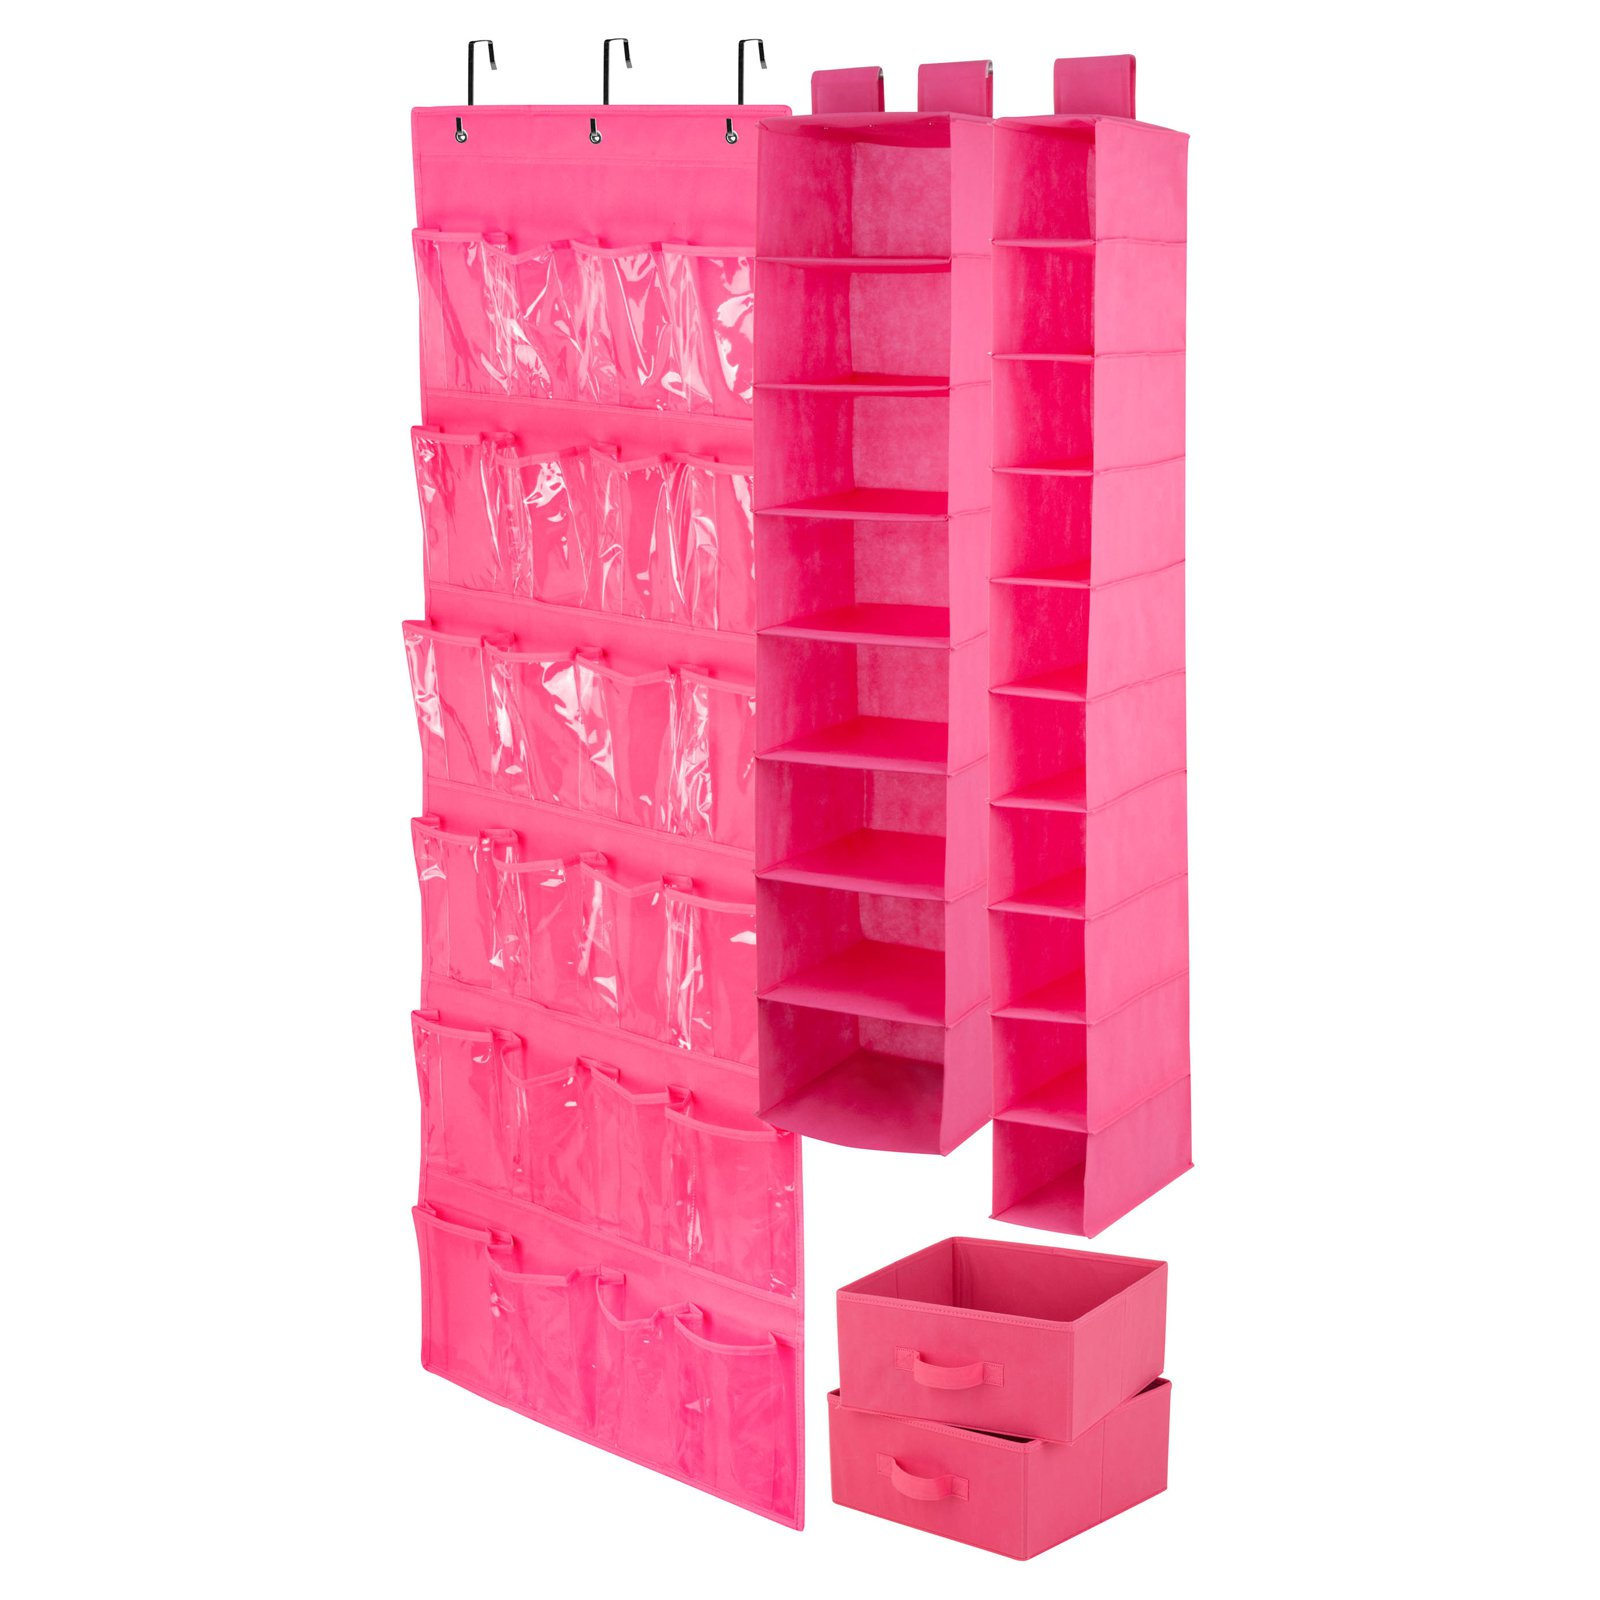 Honey Can Do Room Organization Set, Multicolor (4-Piece Set)